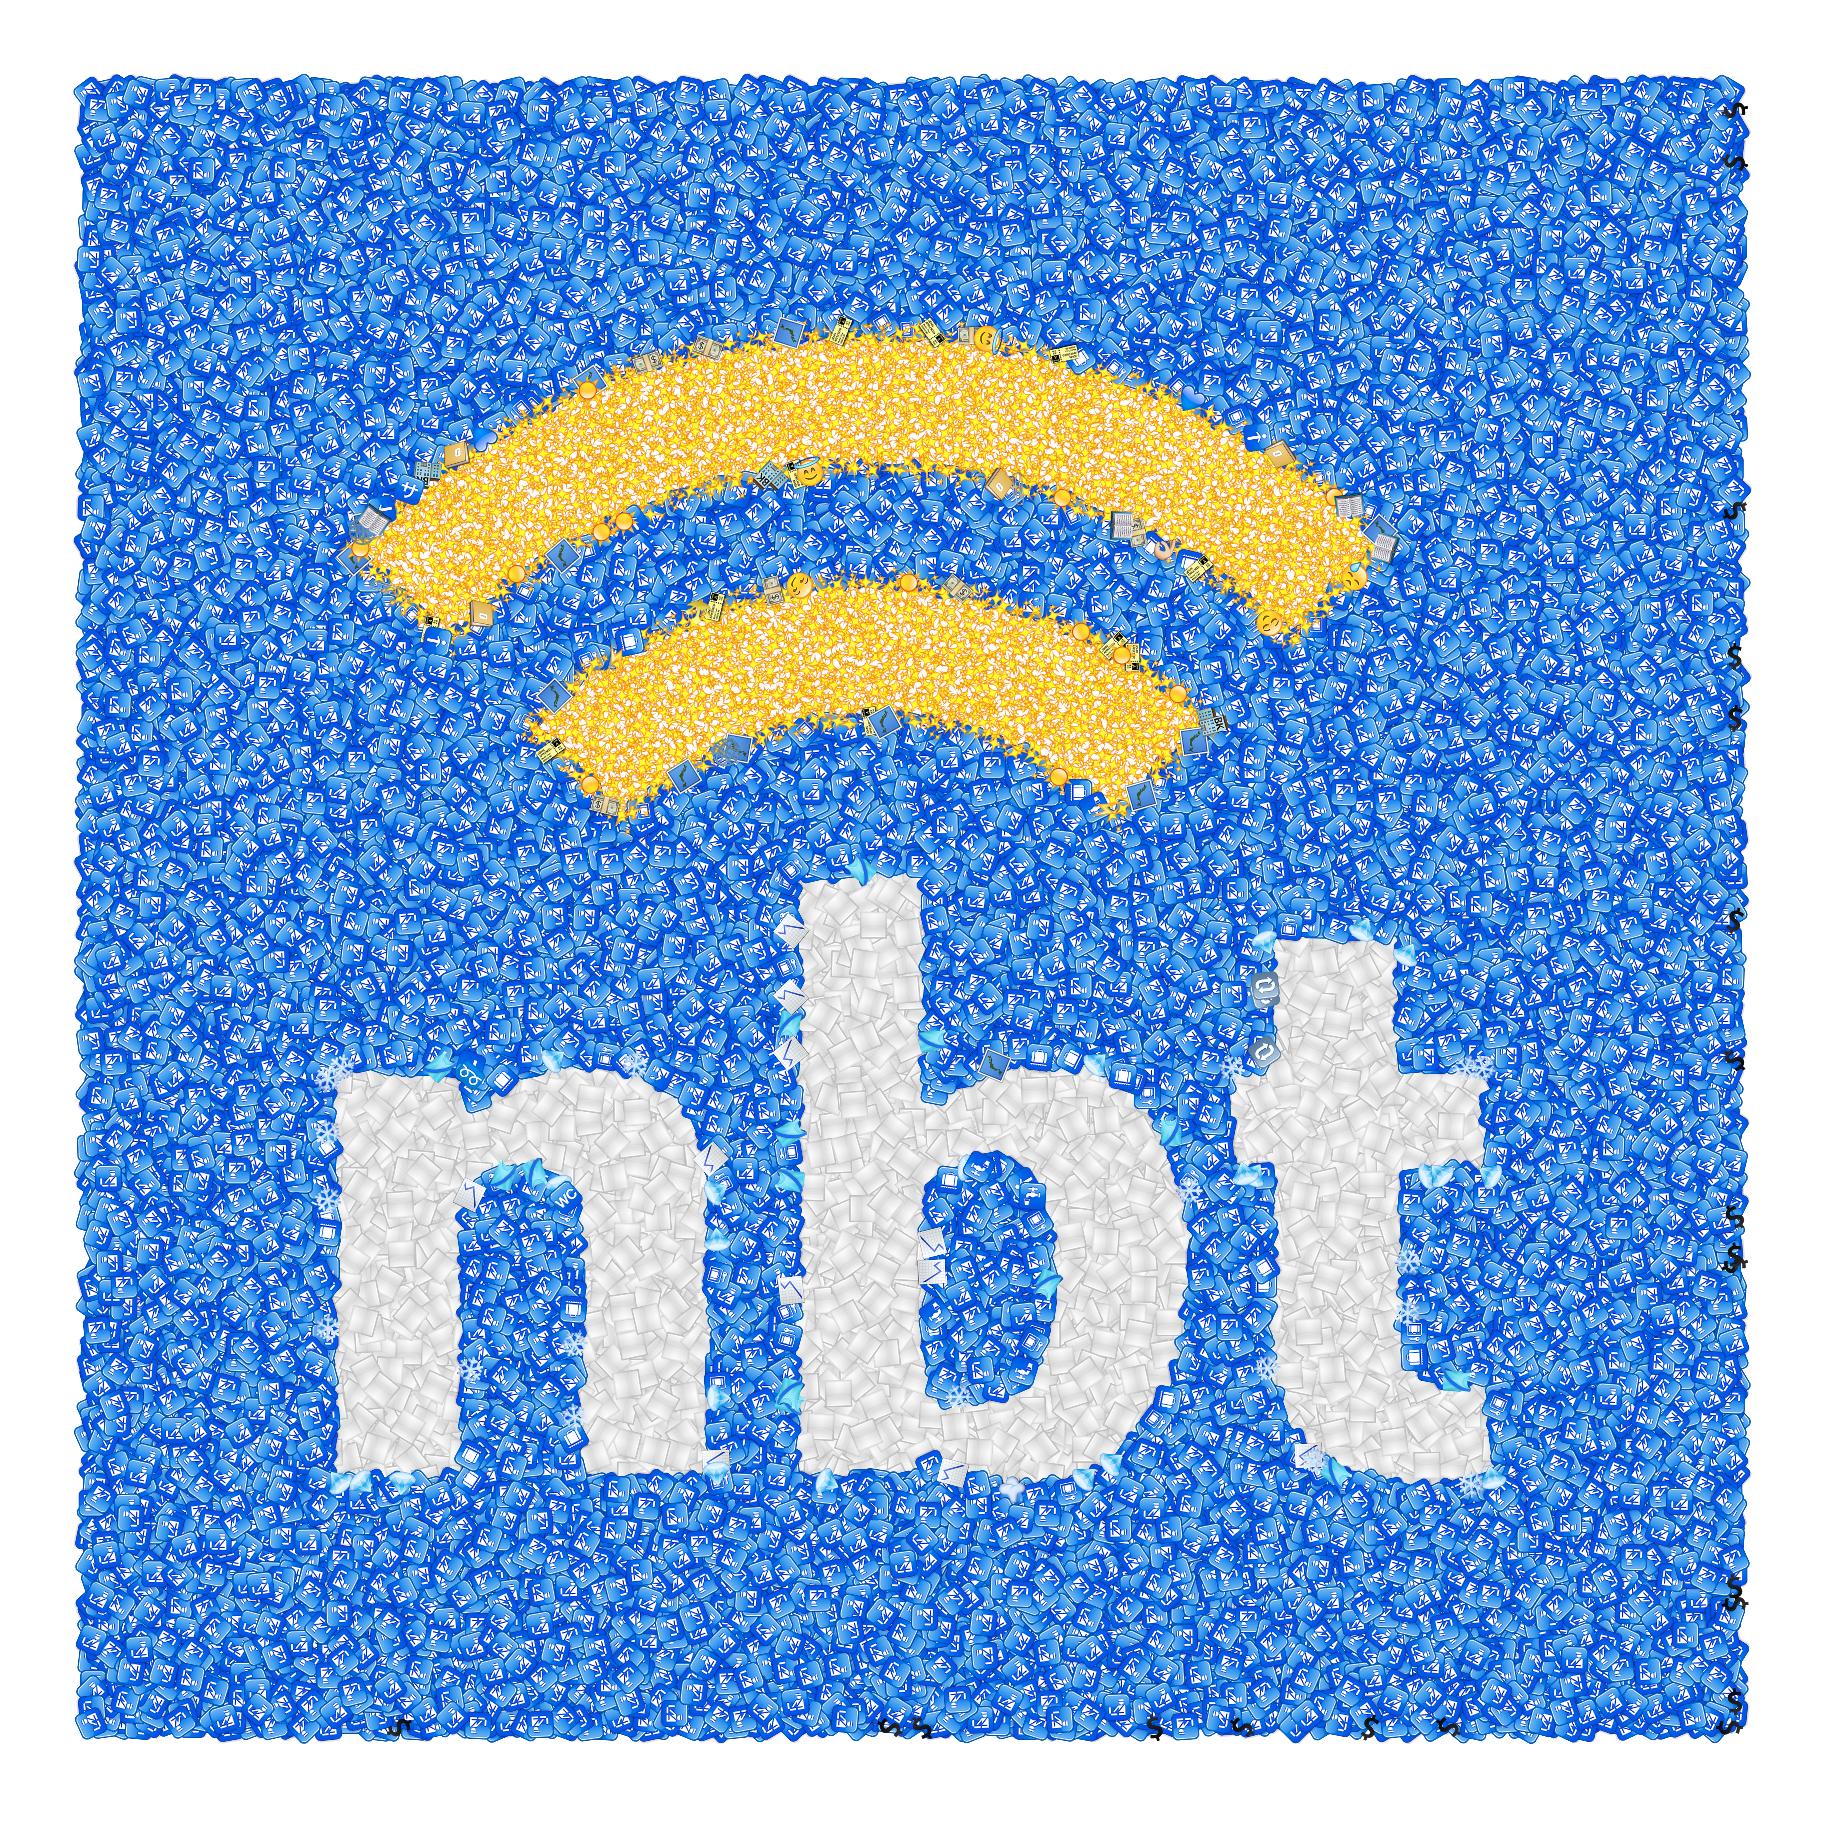 nbt-emoji